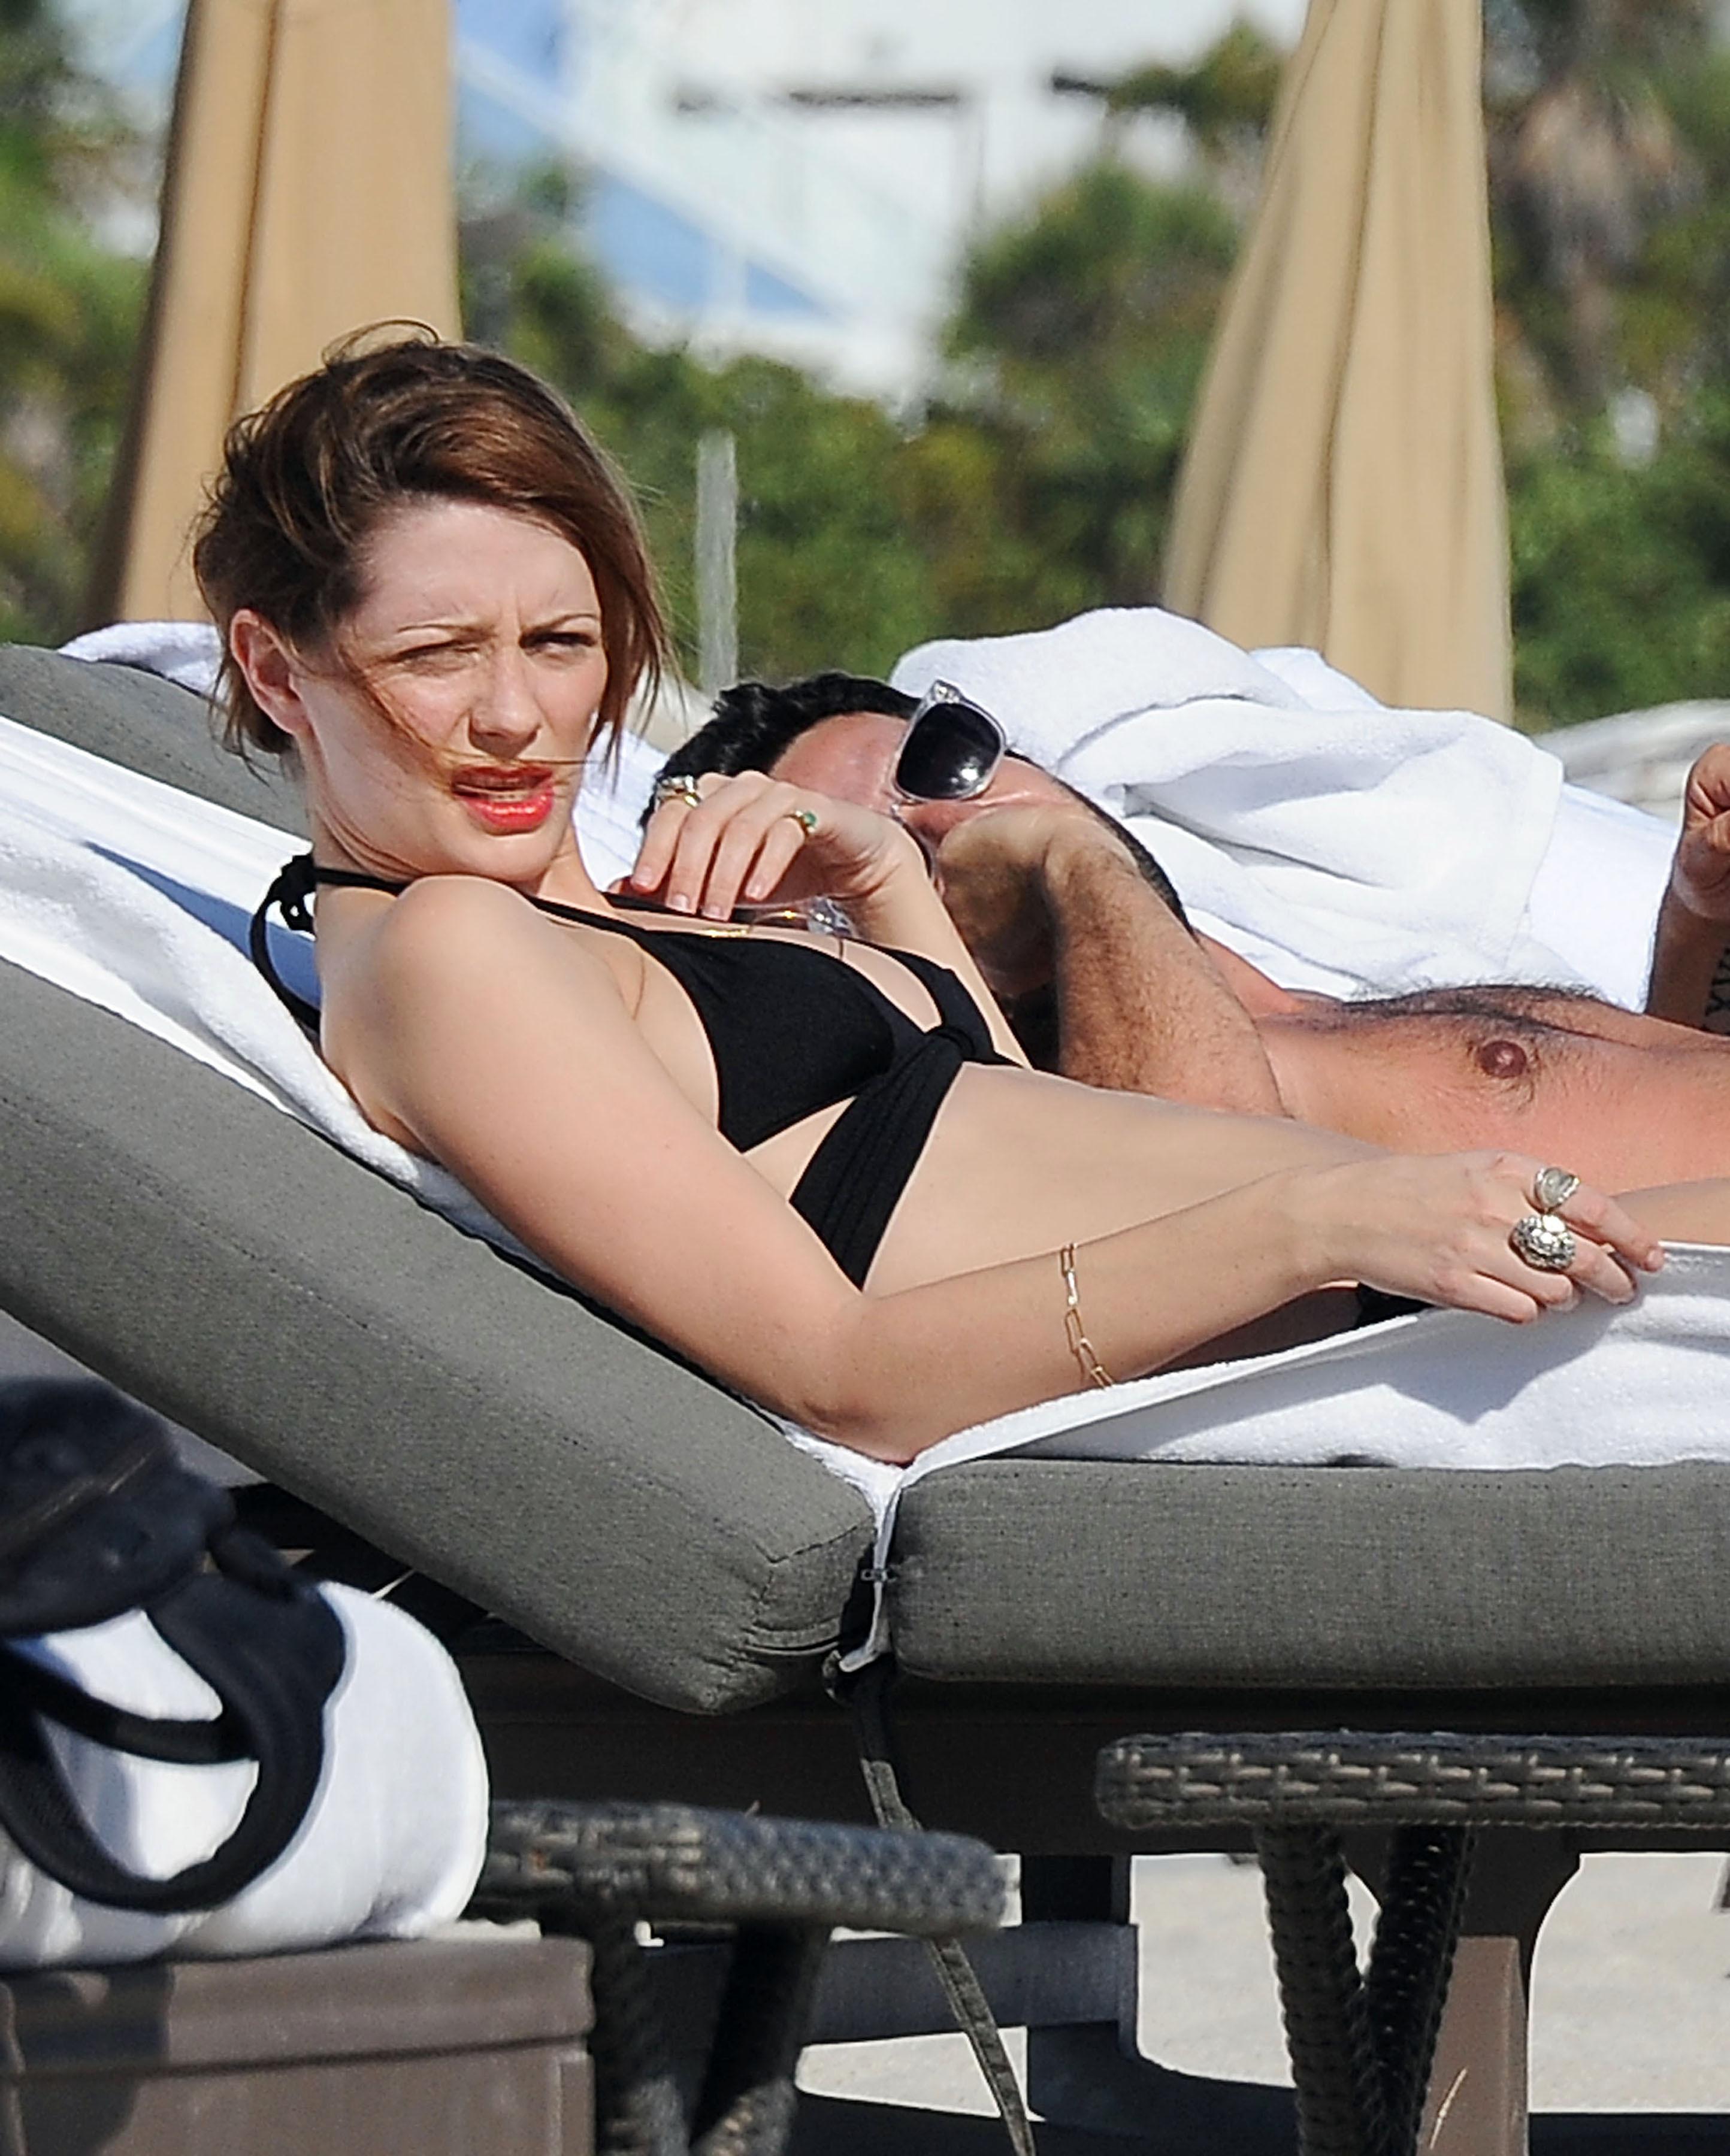 312201136_Mischa_Barton_Bikini_Candids_on_the_Beach_in_Miami_December_27_2011_147_122_363lo.jpg